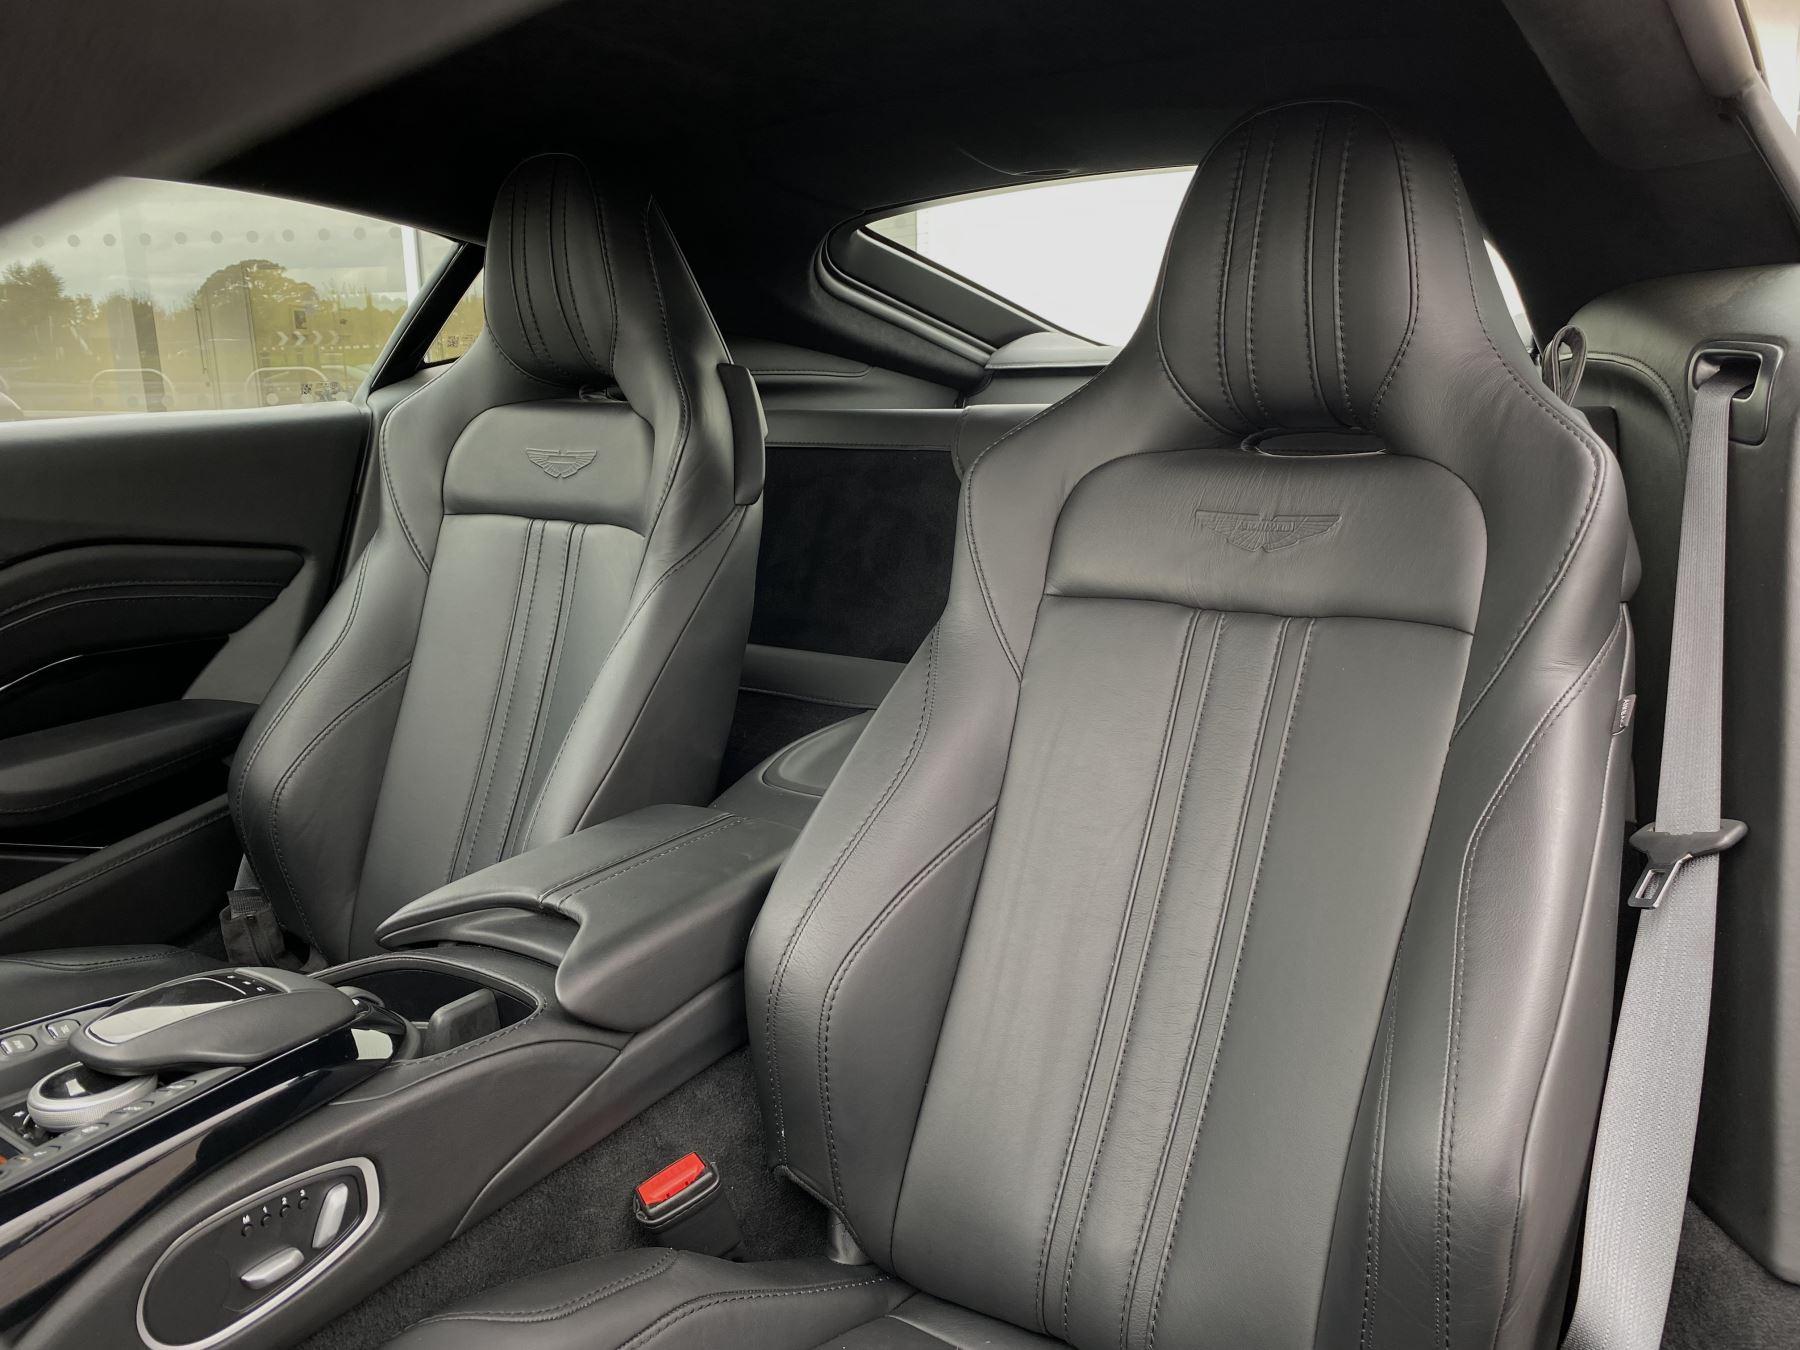 Aston Martin New Vantage 2dr ZF 8 Speed Auto. 4.0 Twin Turbo ZF Gearbox  Reversing Camera Heated Seats Ceramic Brakes image 25